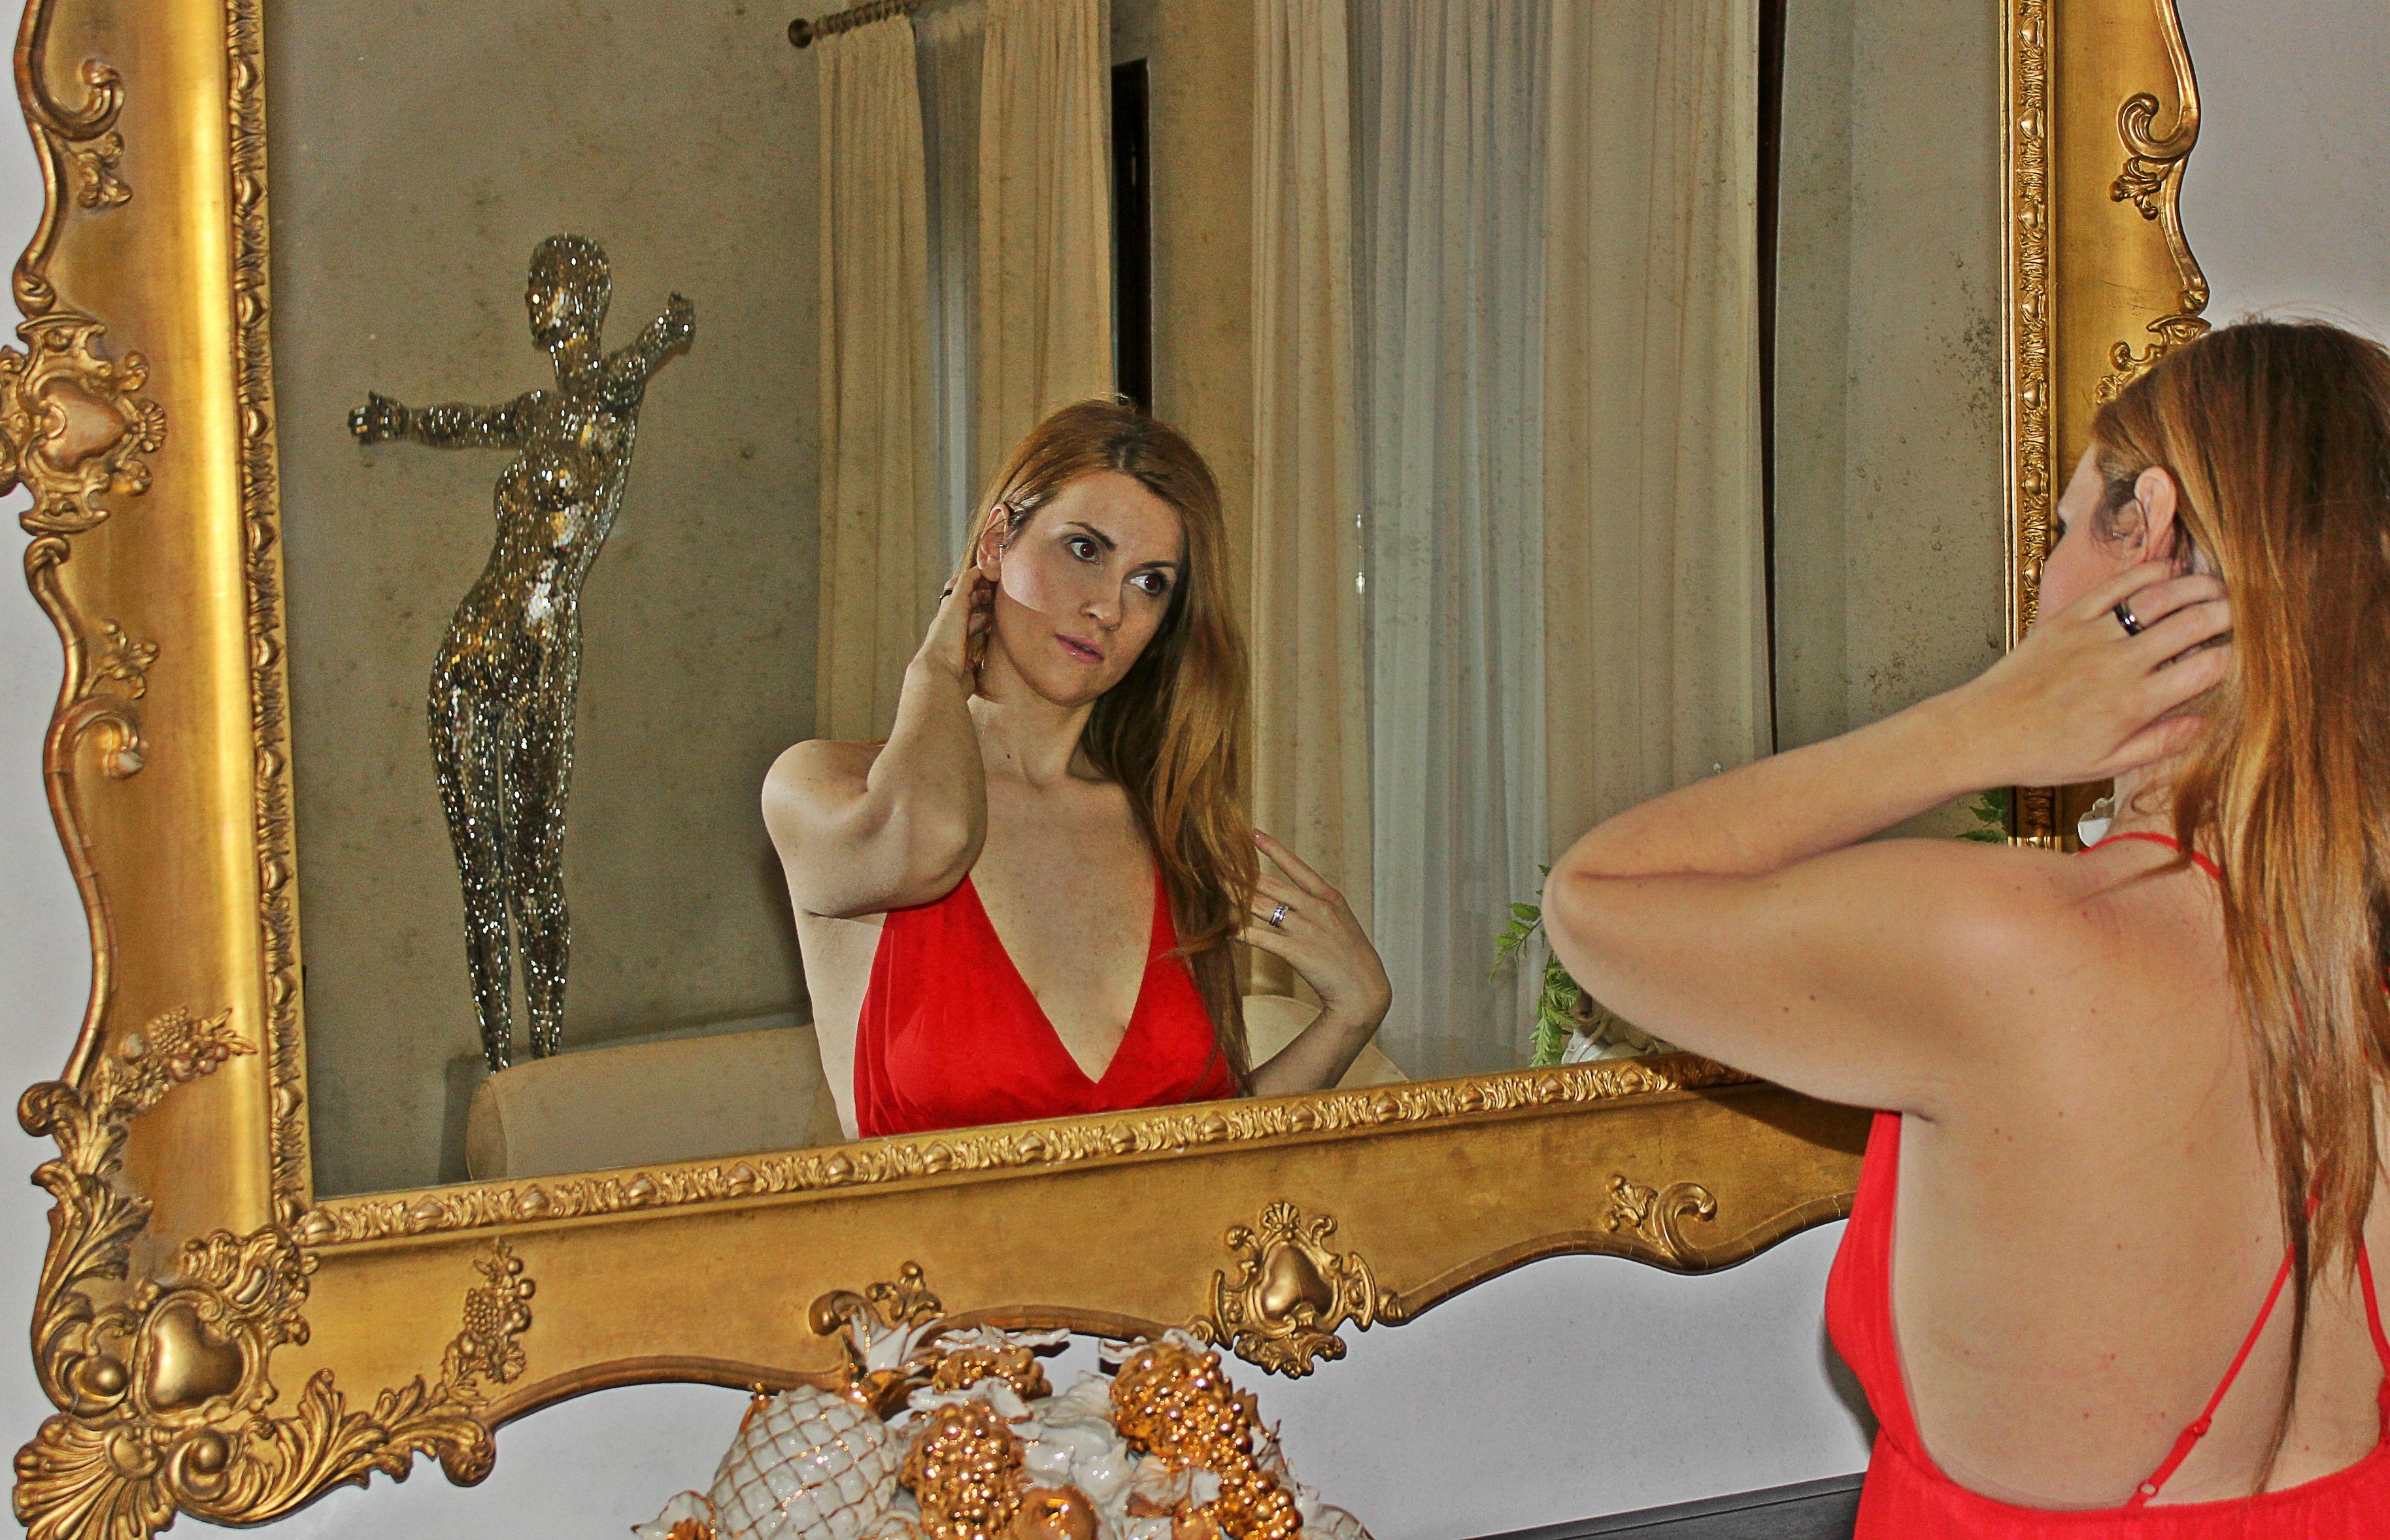 elisabettabertolini-femminilità-unabitorosso-abitolungo-abitosera-znu-outfit-elegance-fashionblogge4